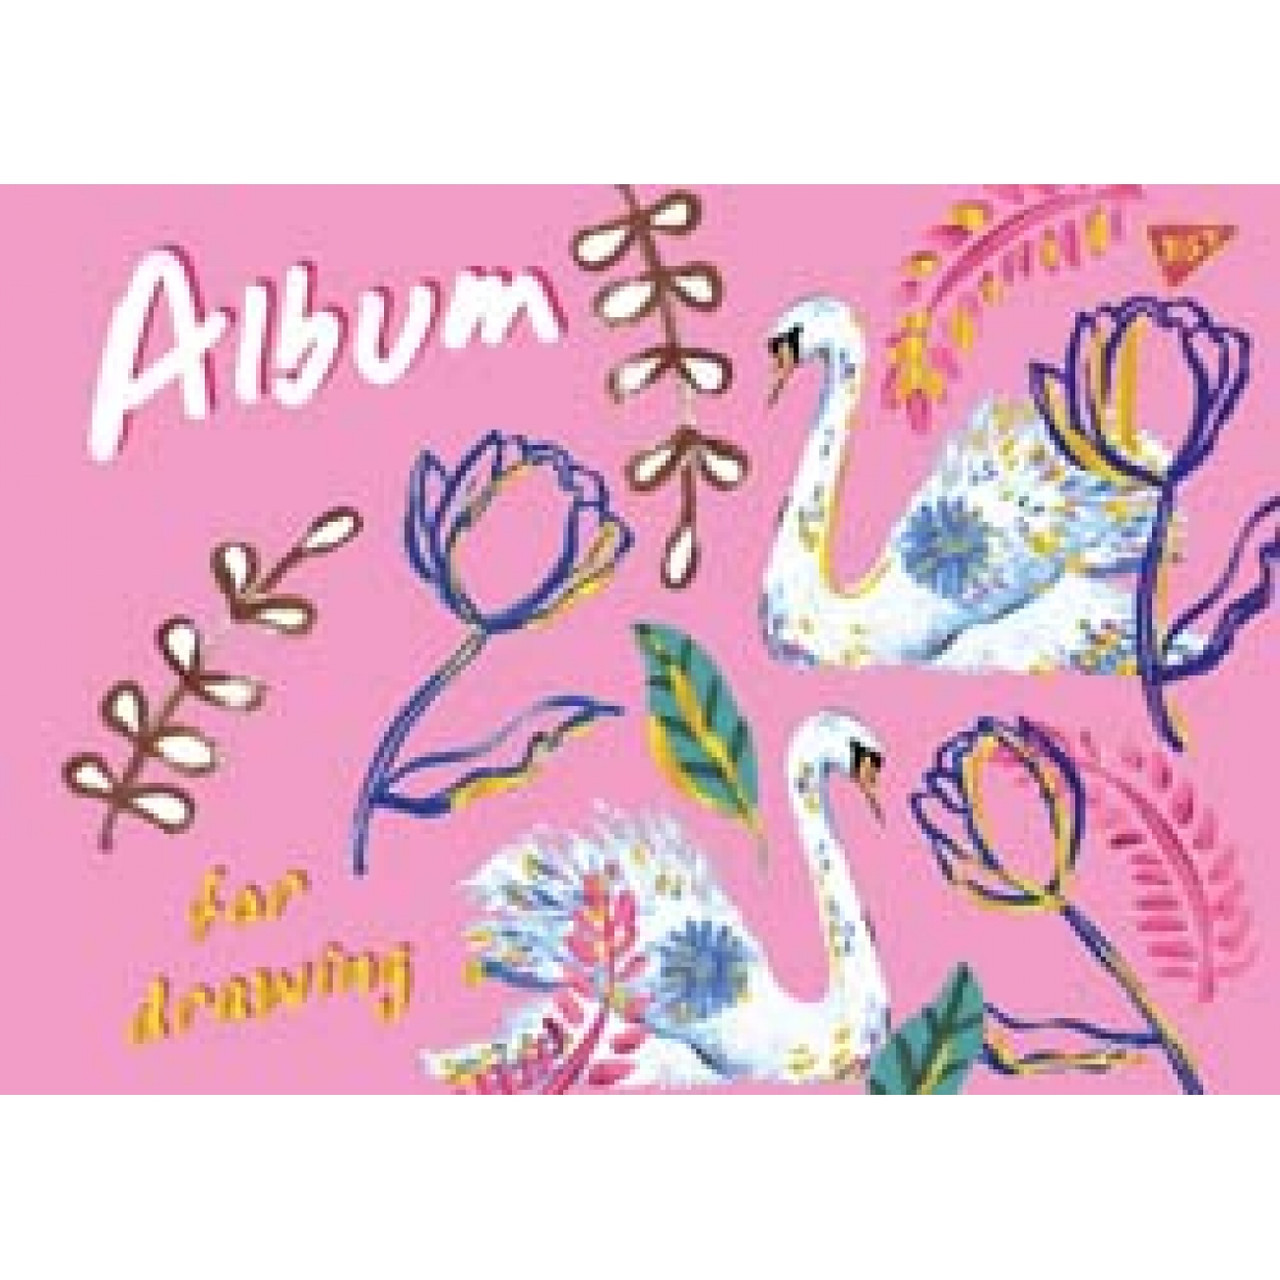 "Альбом для рисования А4 20л/100 ""Bon cote"" на спирали мат.лам+глит золото+фол зол  YES (уп. 3 шт.)"